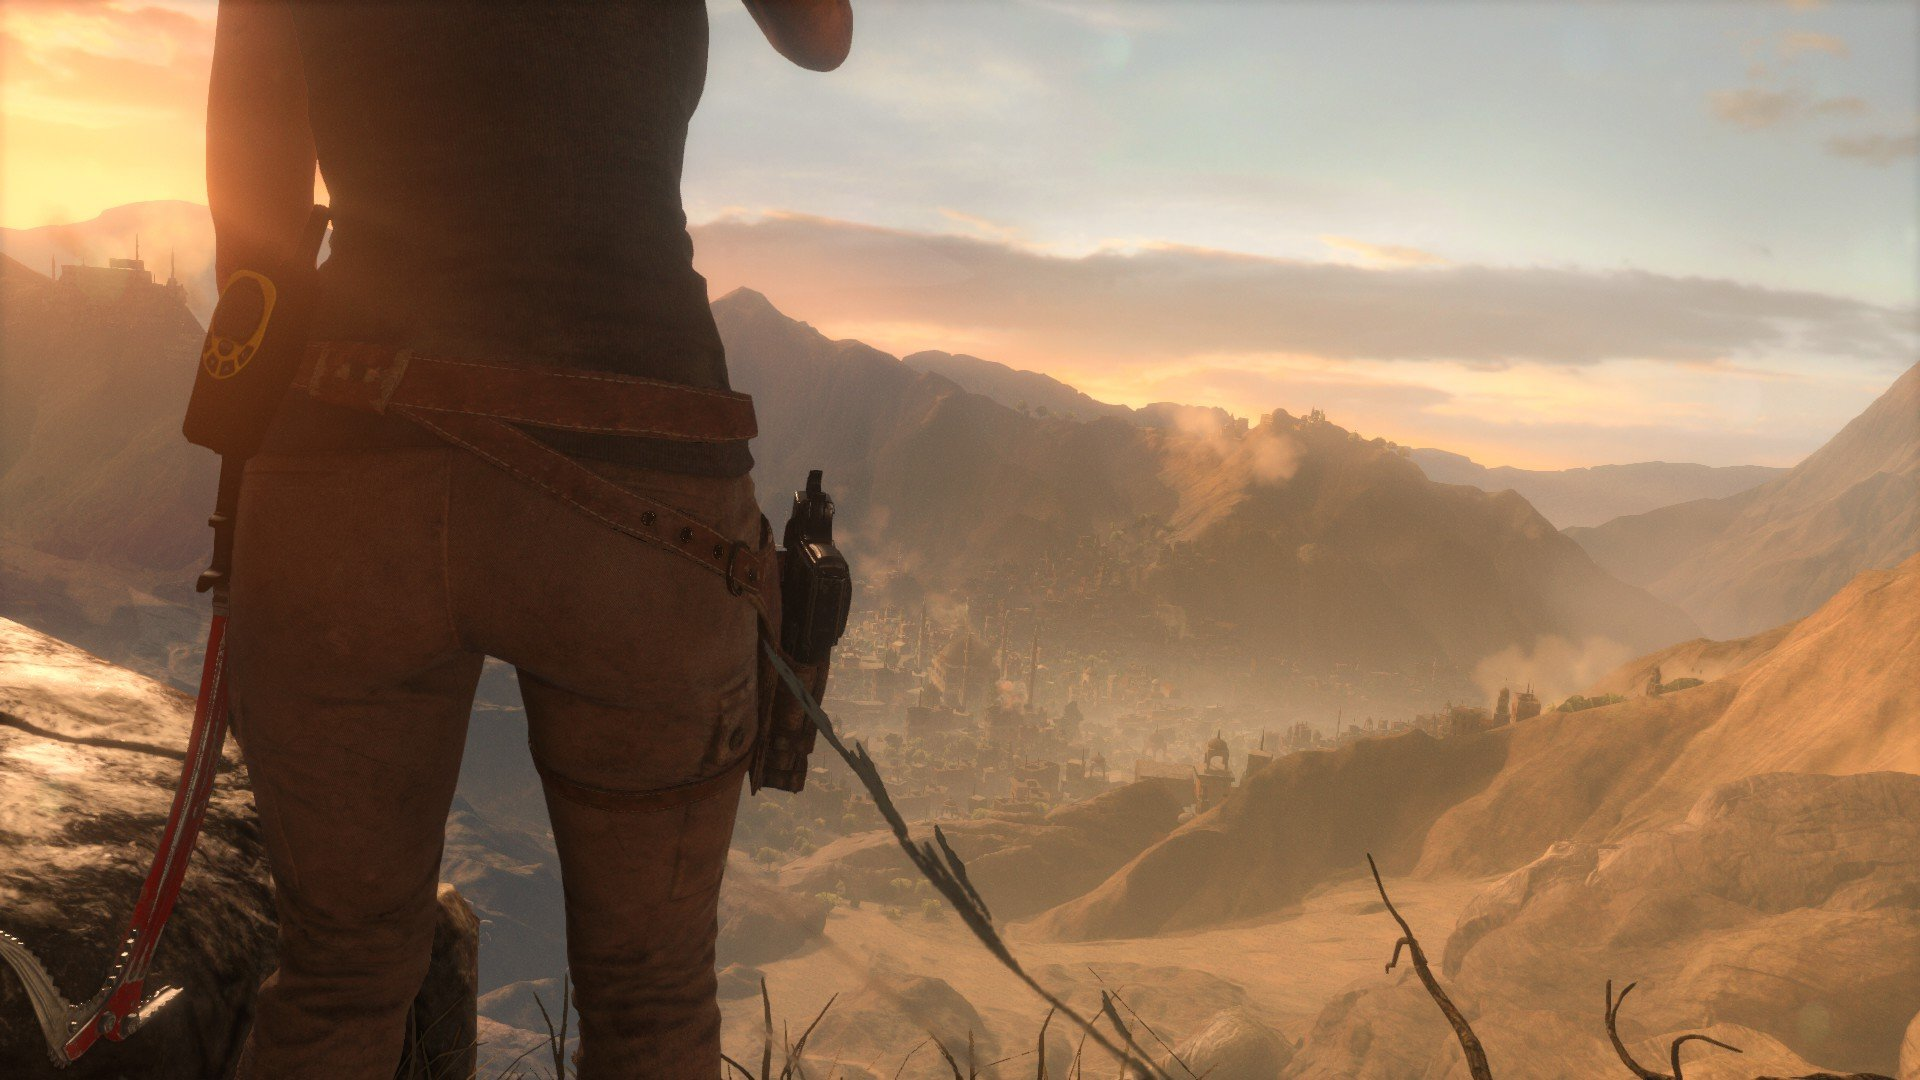 Rise of the Tomb Raider или да когда же этот медведь сдохнет?. - Изображение 2